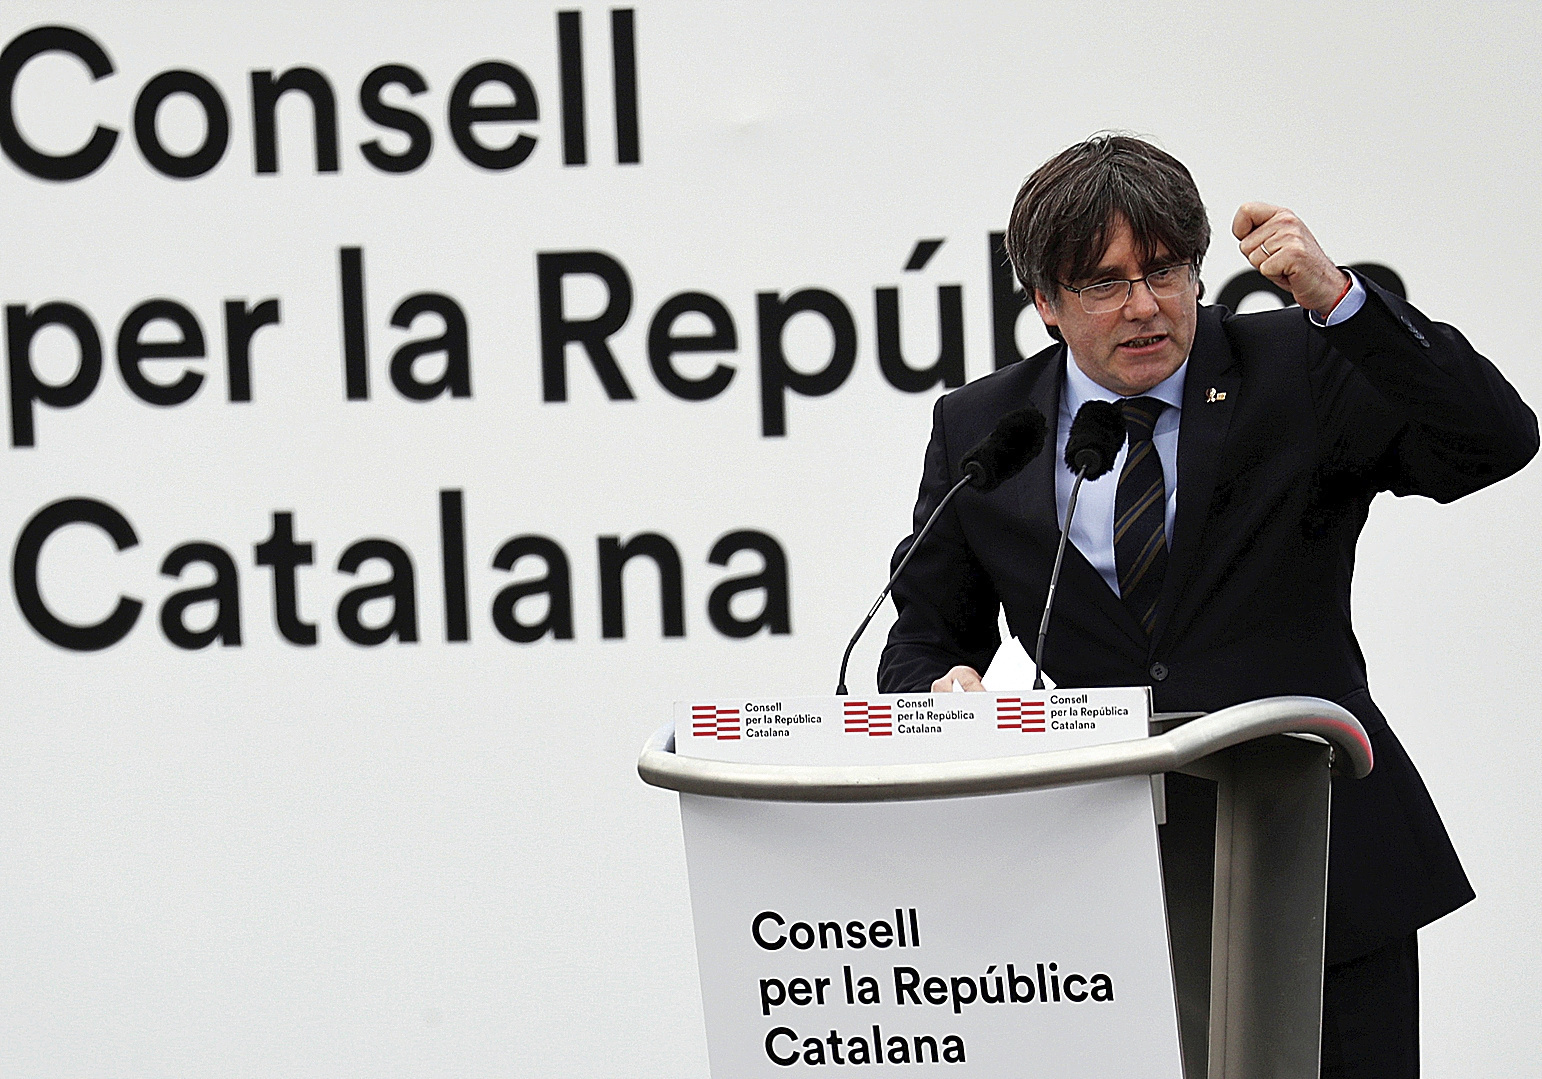 Carles Puigdemont en un mitin en Perpignan en febrero de 2020